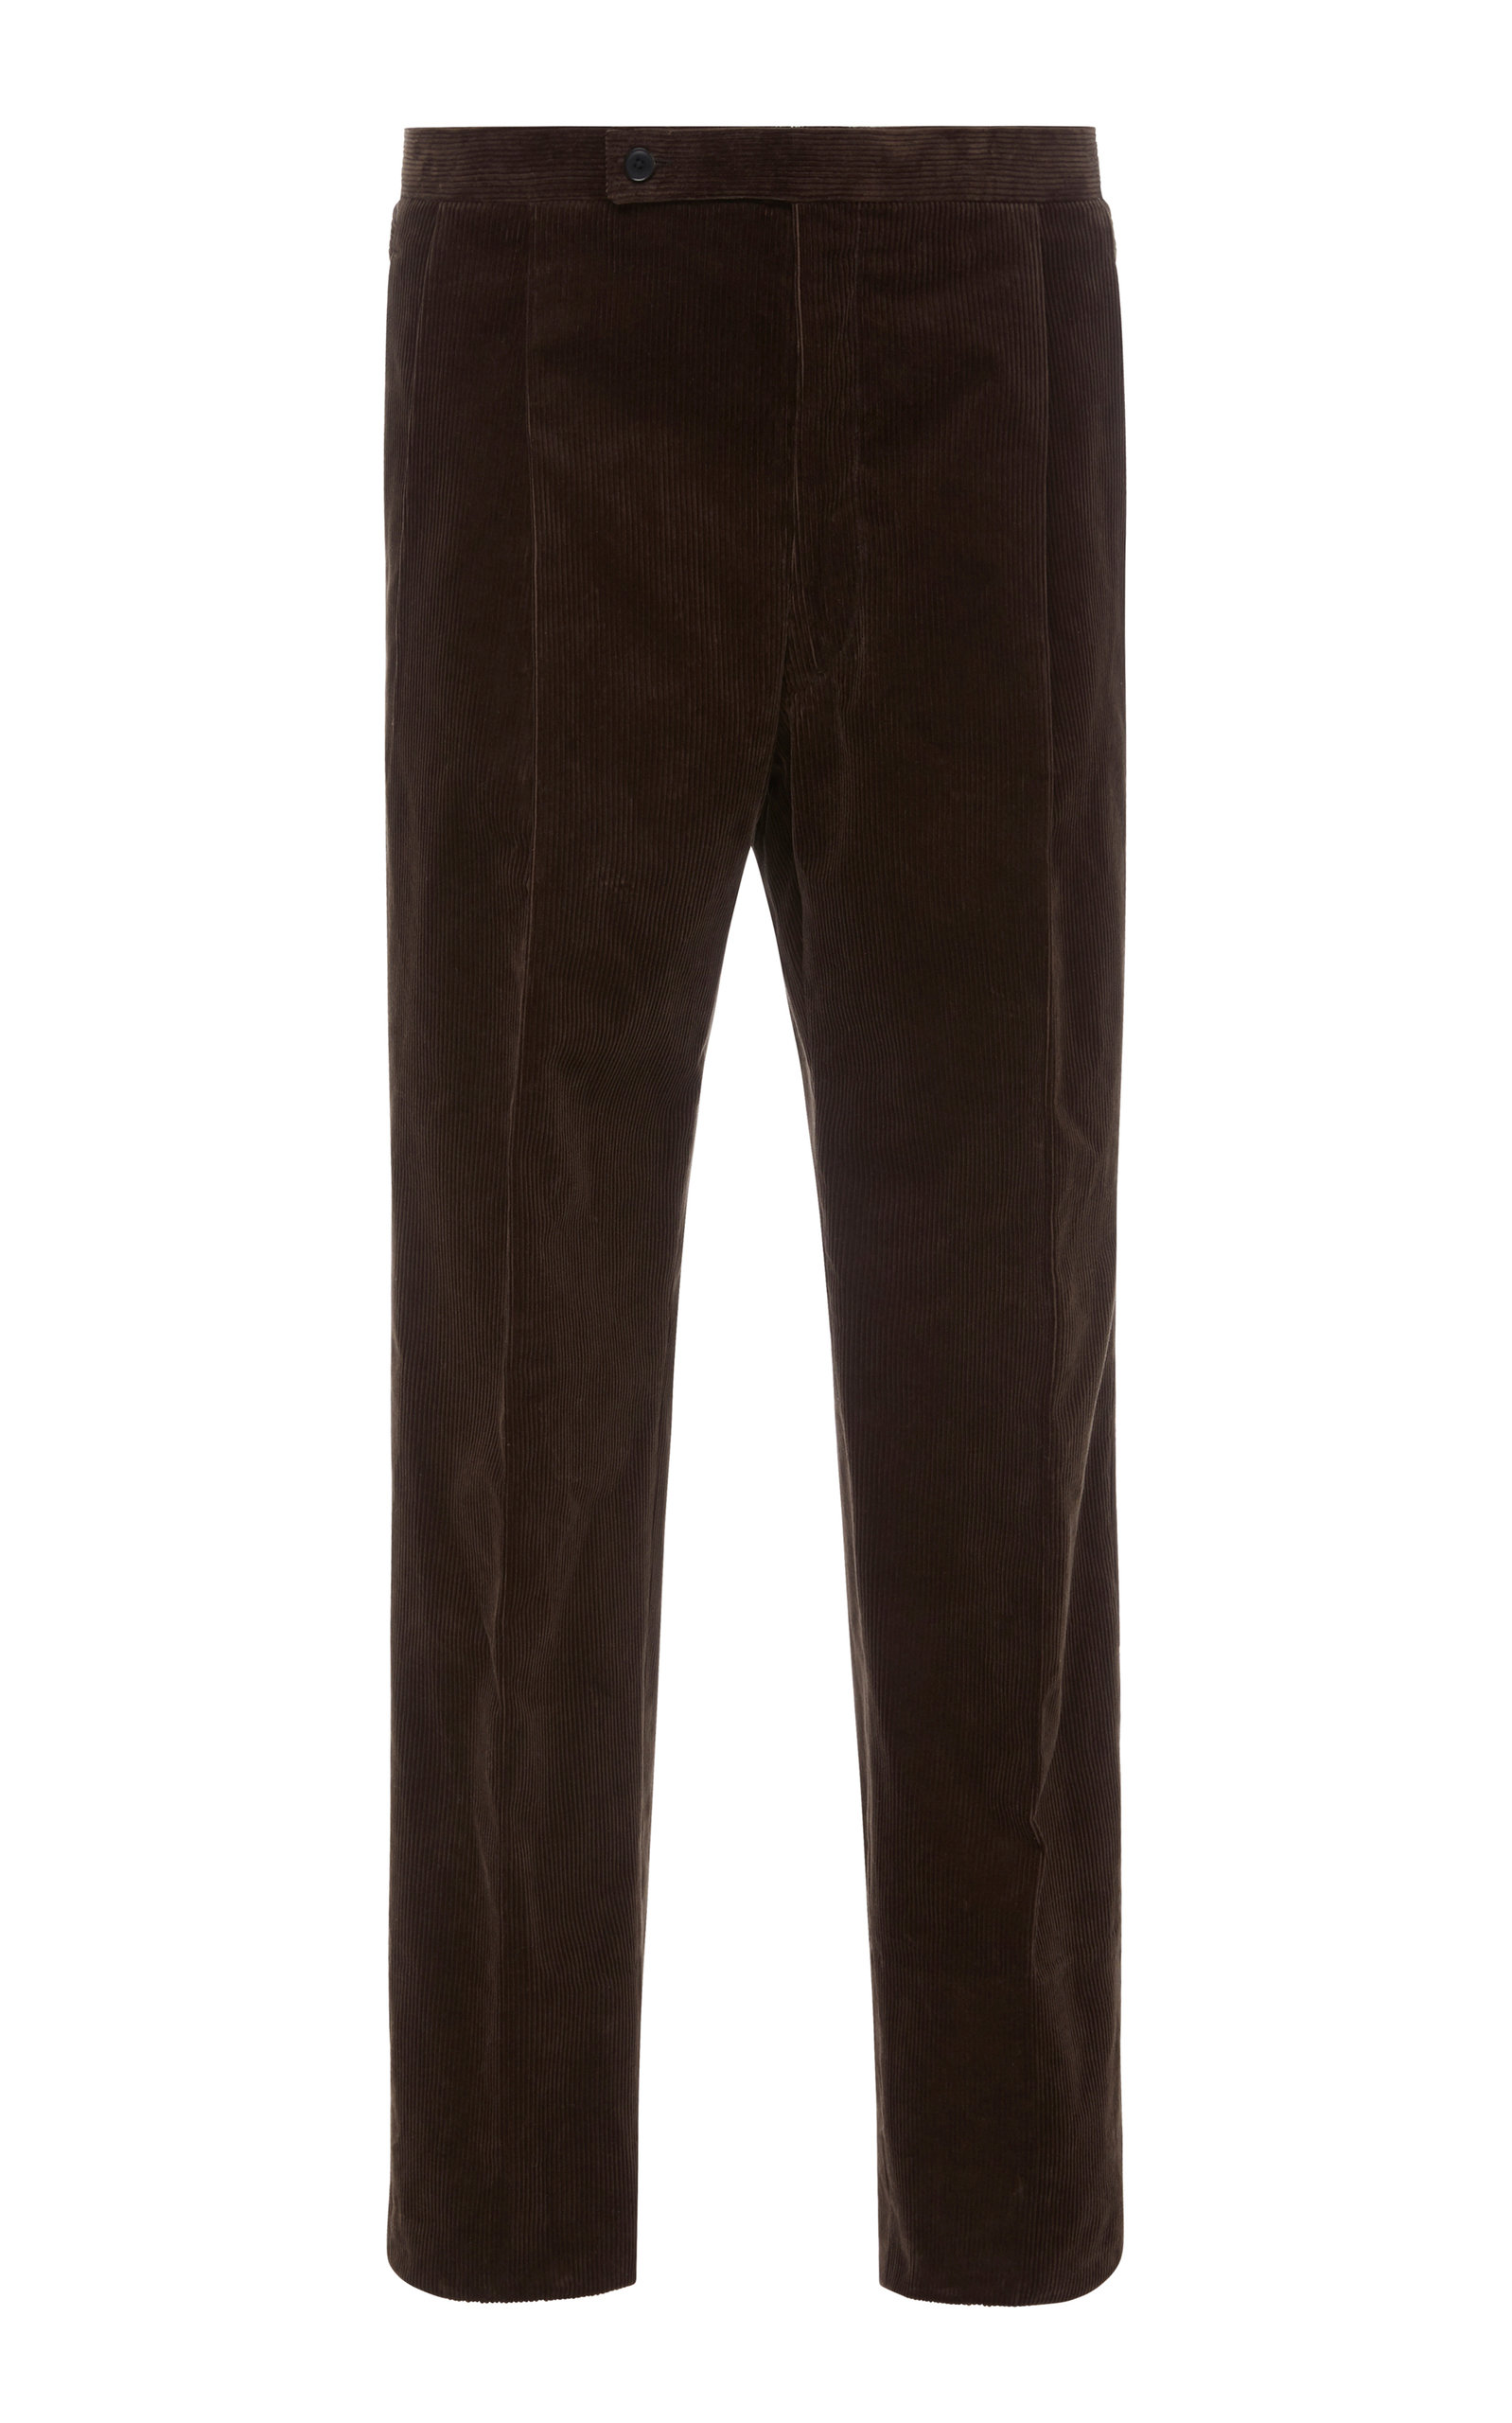 CAMOSHITA Corduroy Box Pleat Dress Pants in Brown